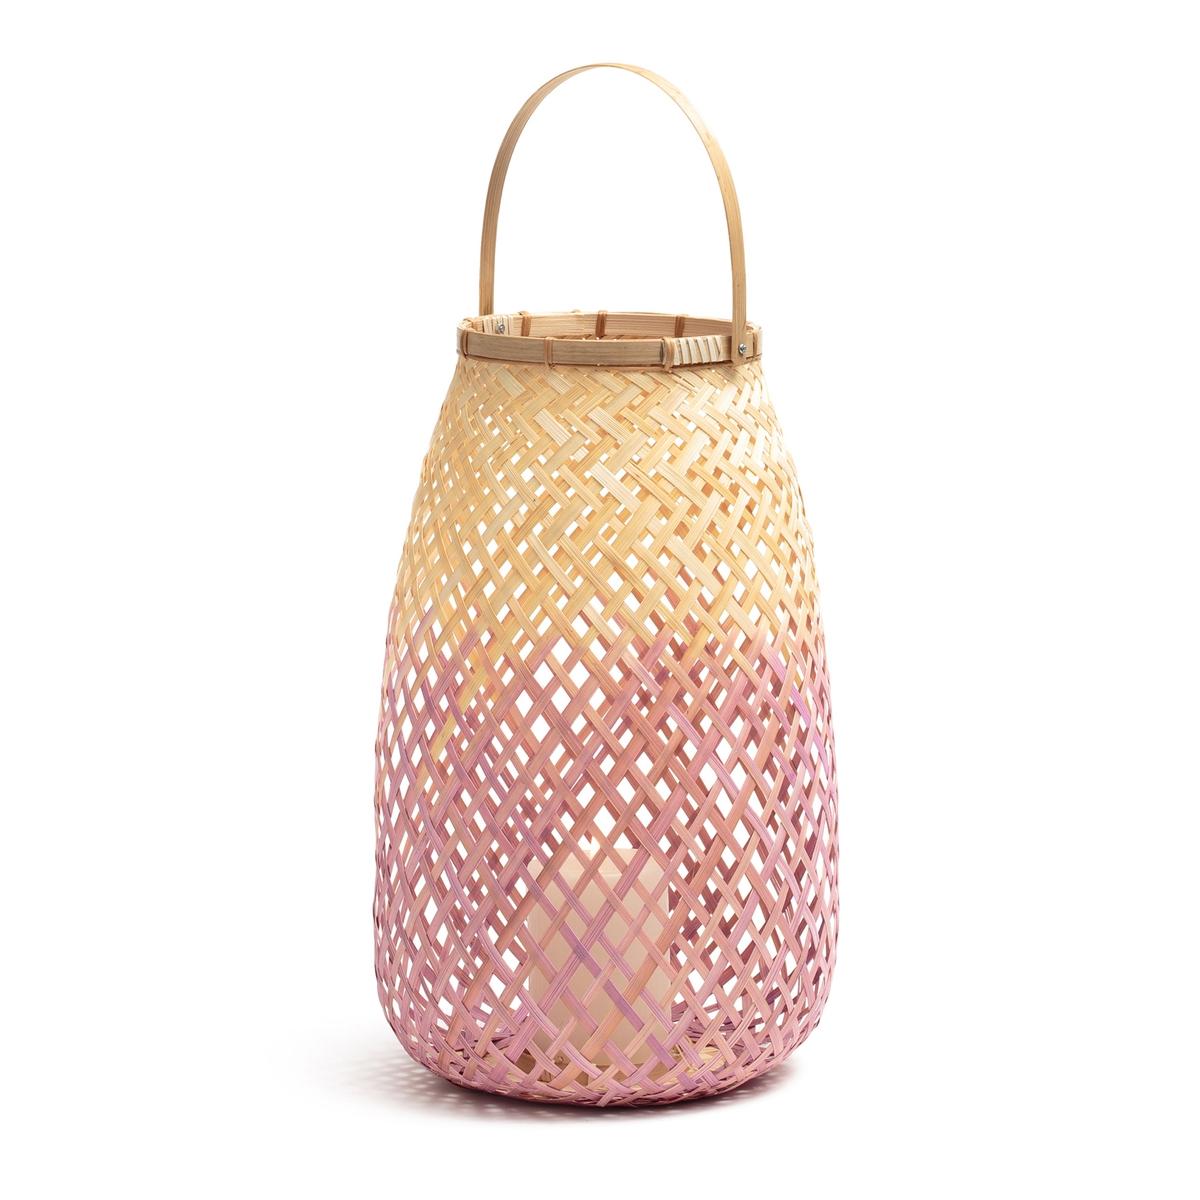 Lanterna bambù rosa/naturale, CORDO